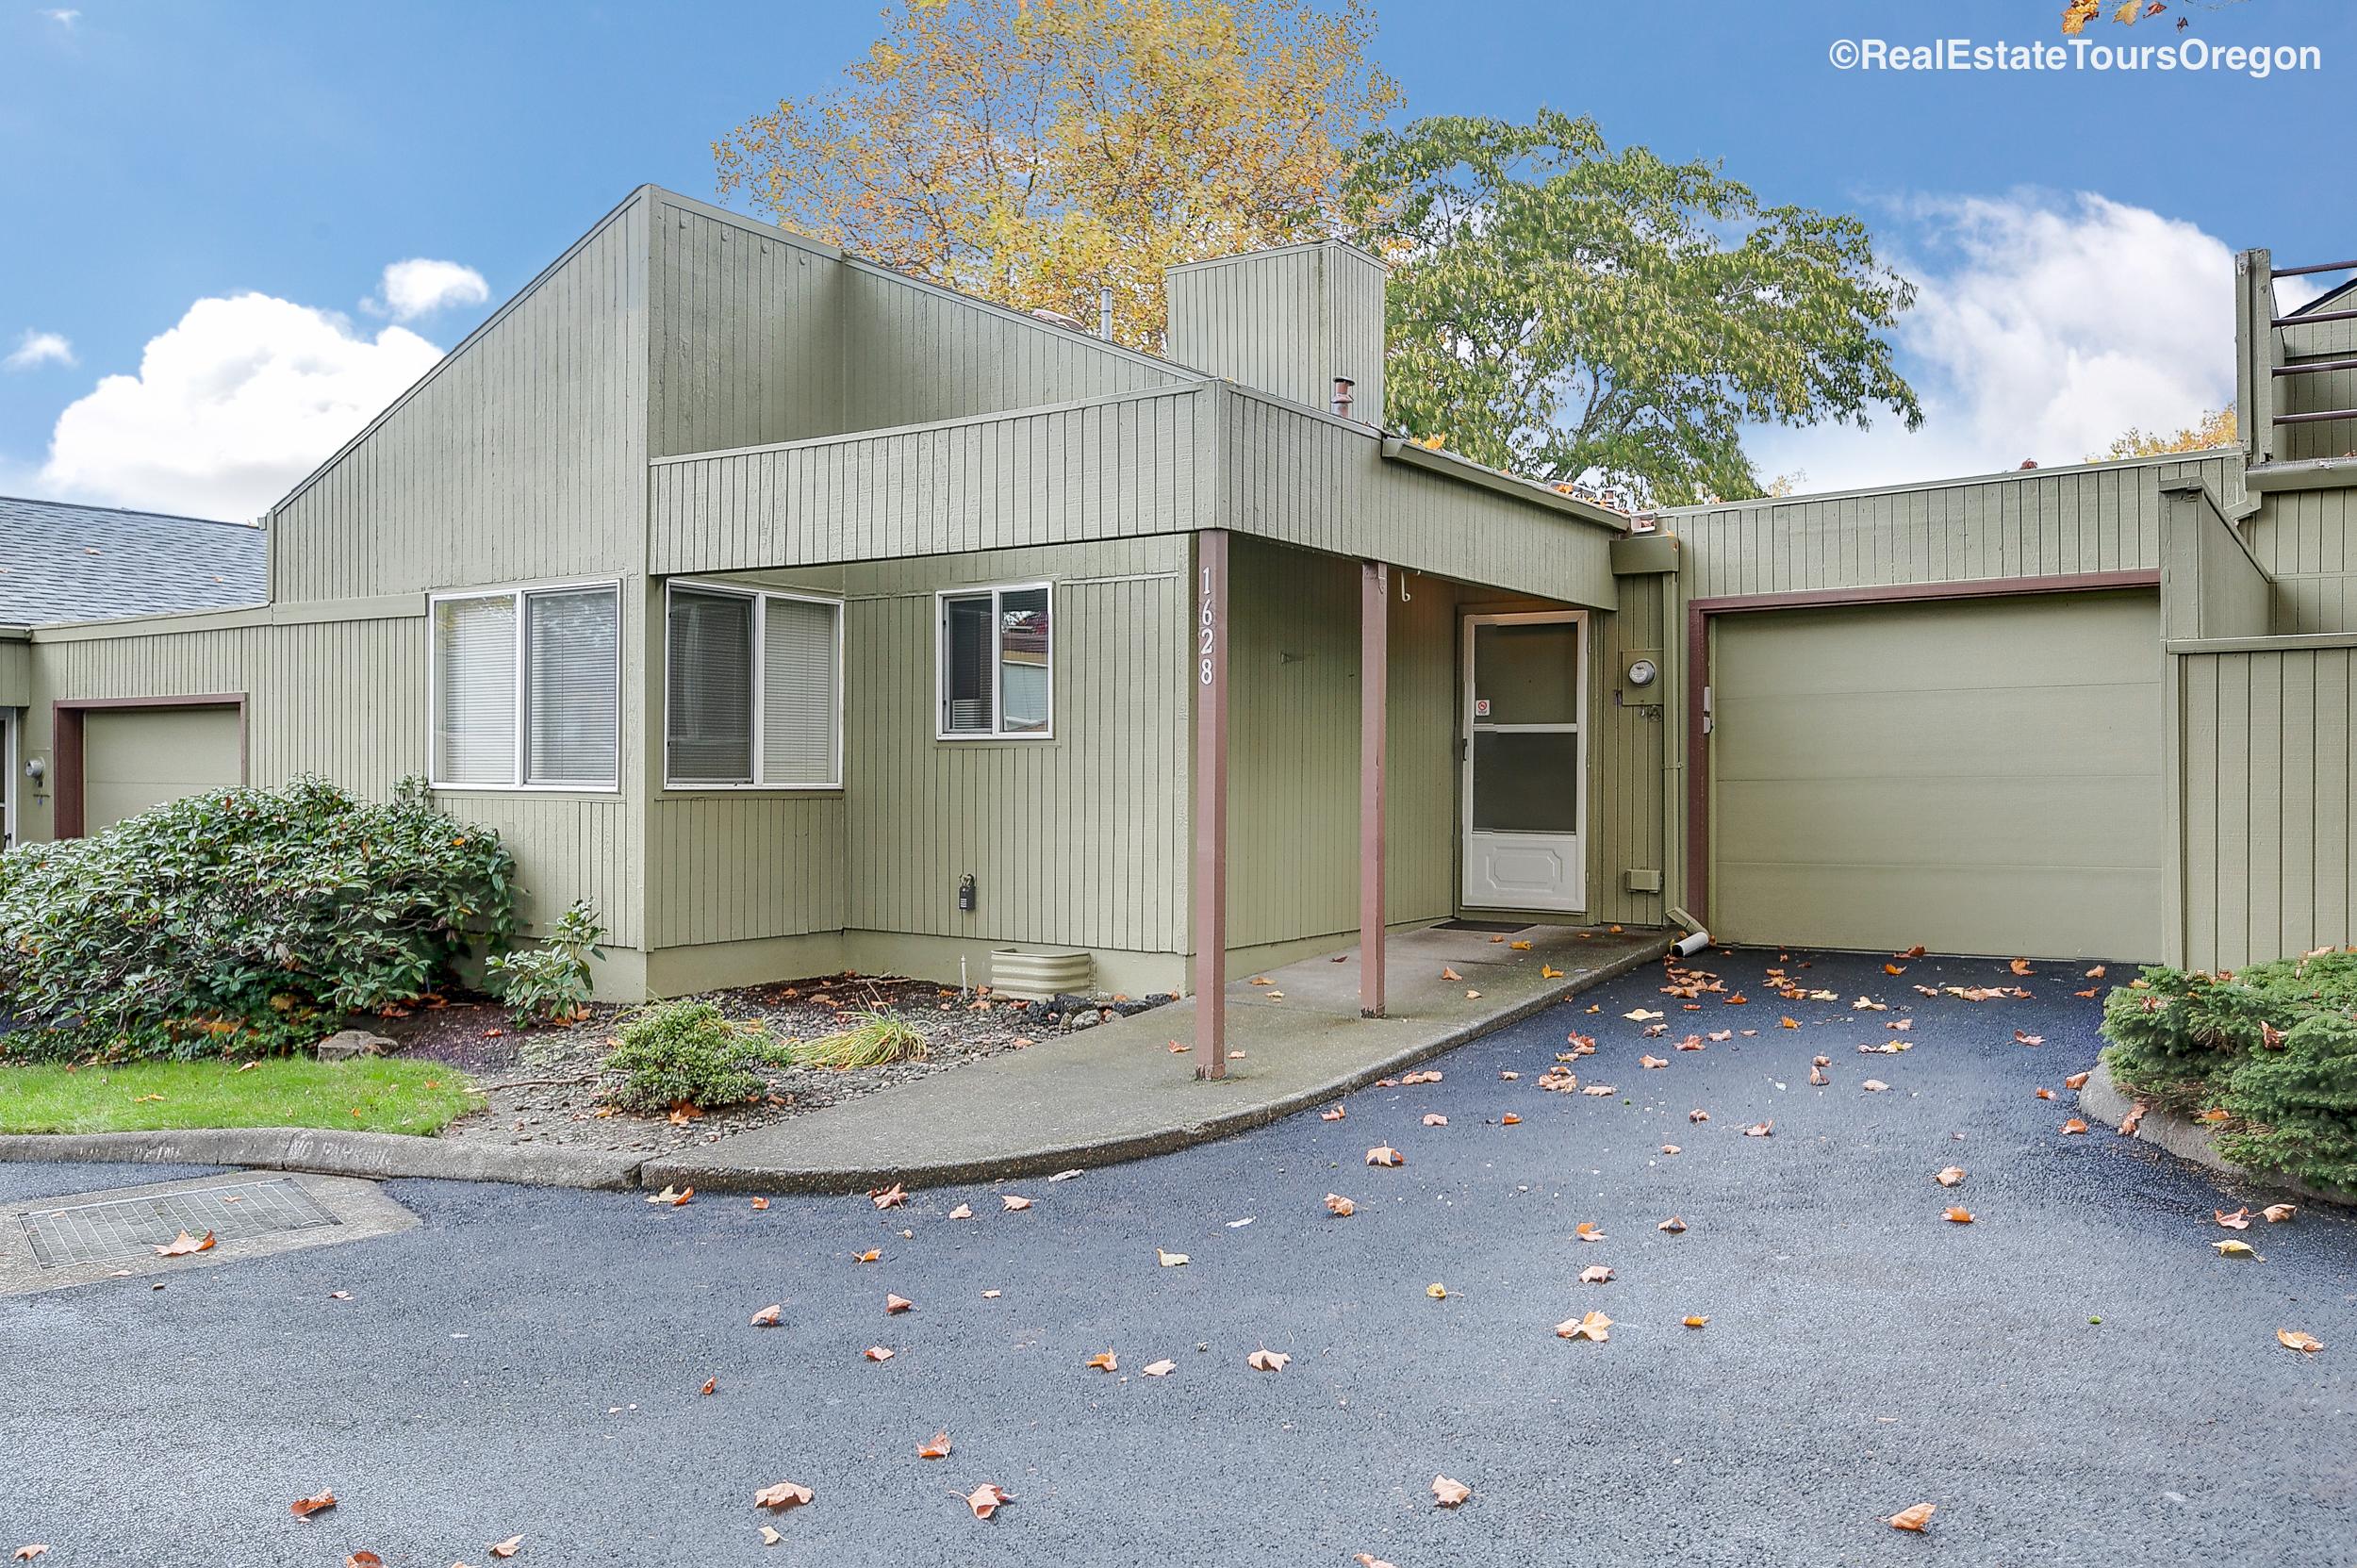 SOLD: 1628 NW Lakeway Lane, Beaverton Oregon